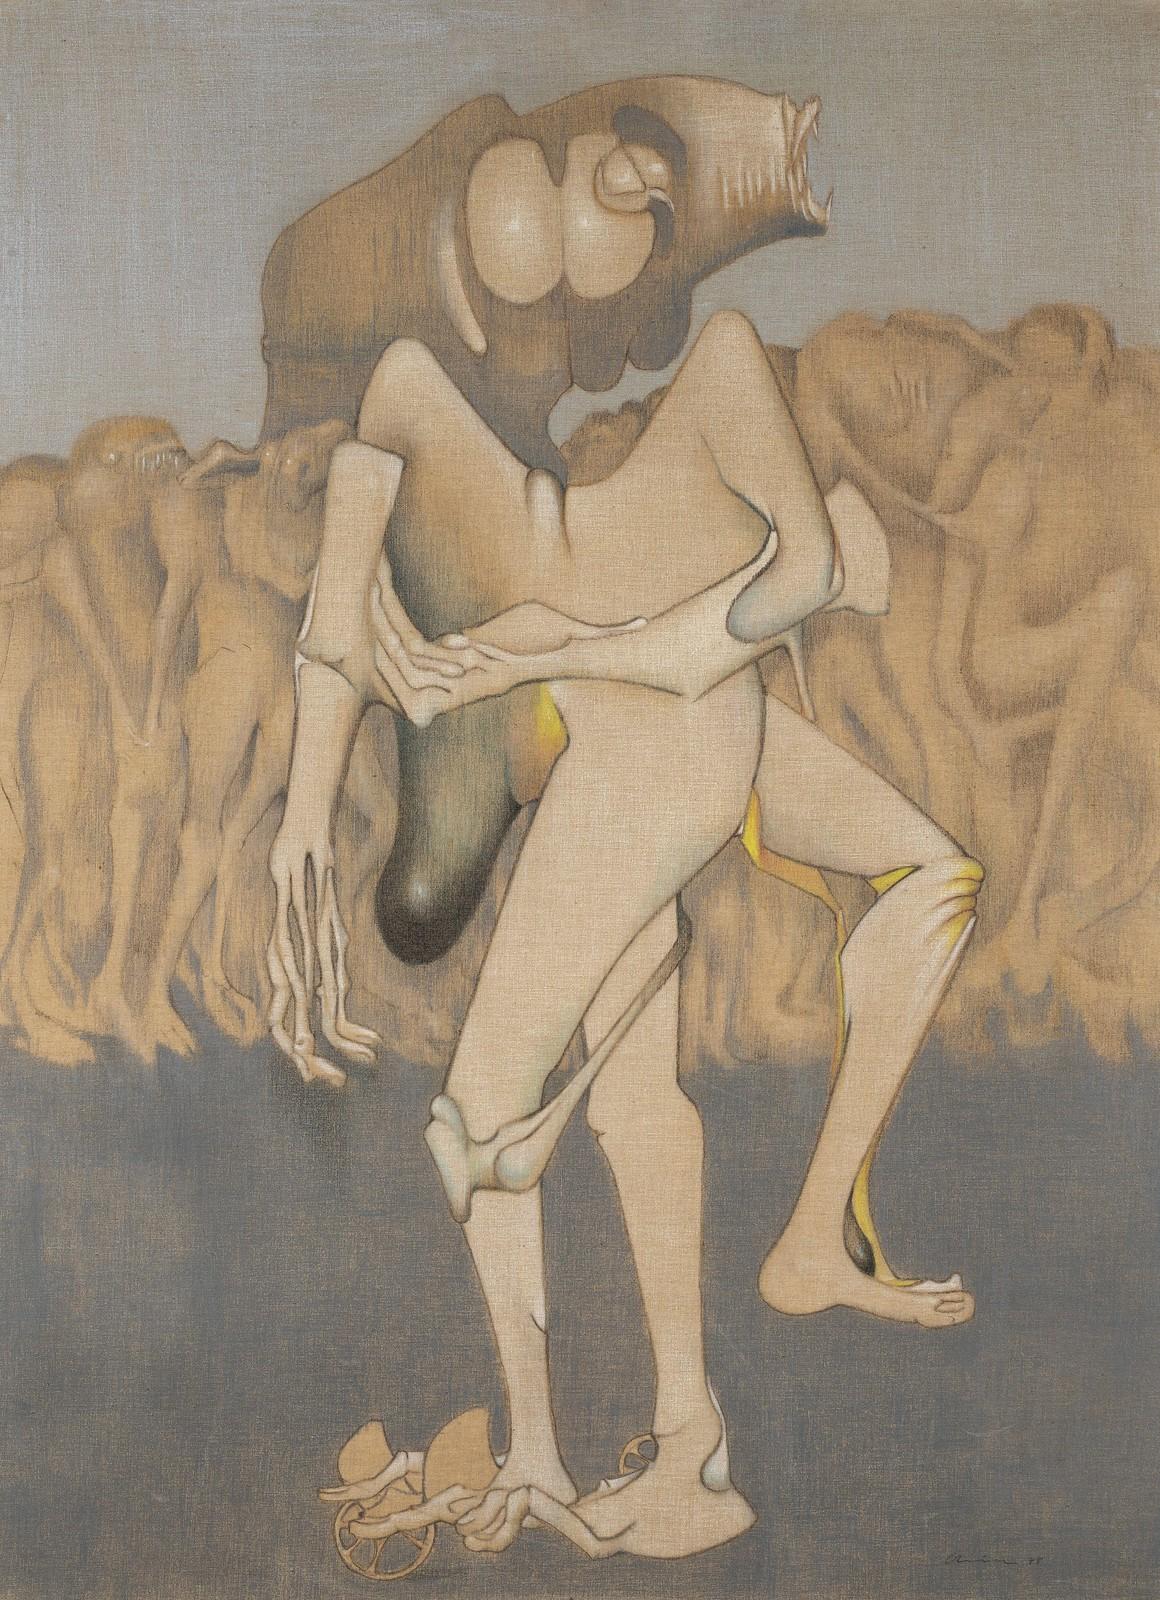 Gerardo Chavez Lopez - The Midnight Demon, 1975